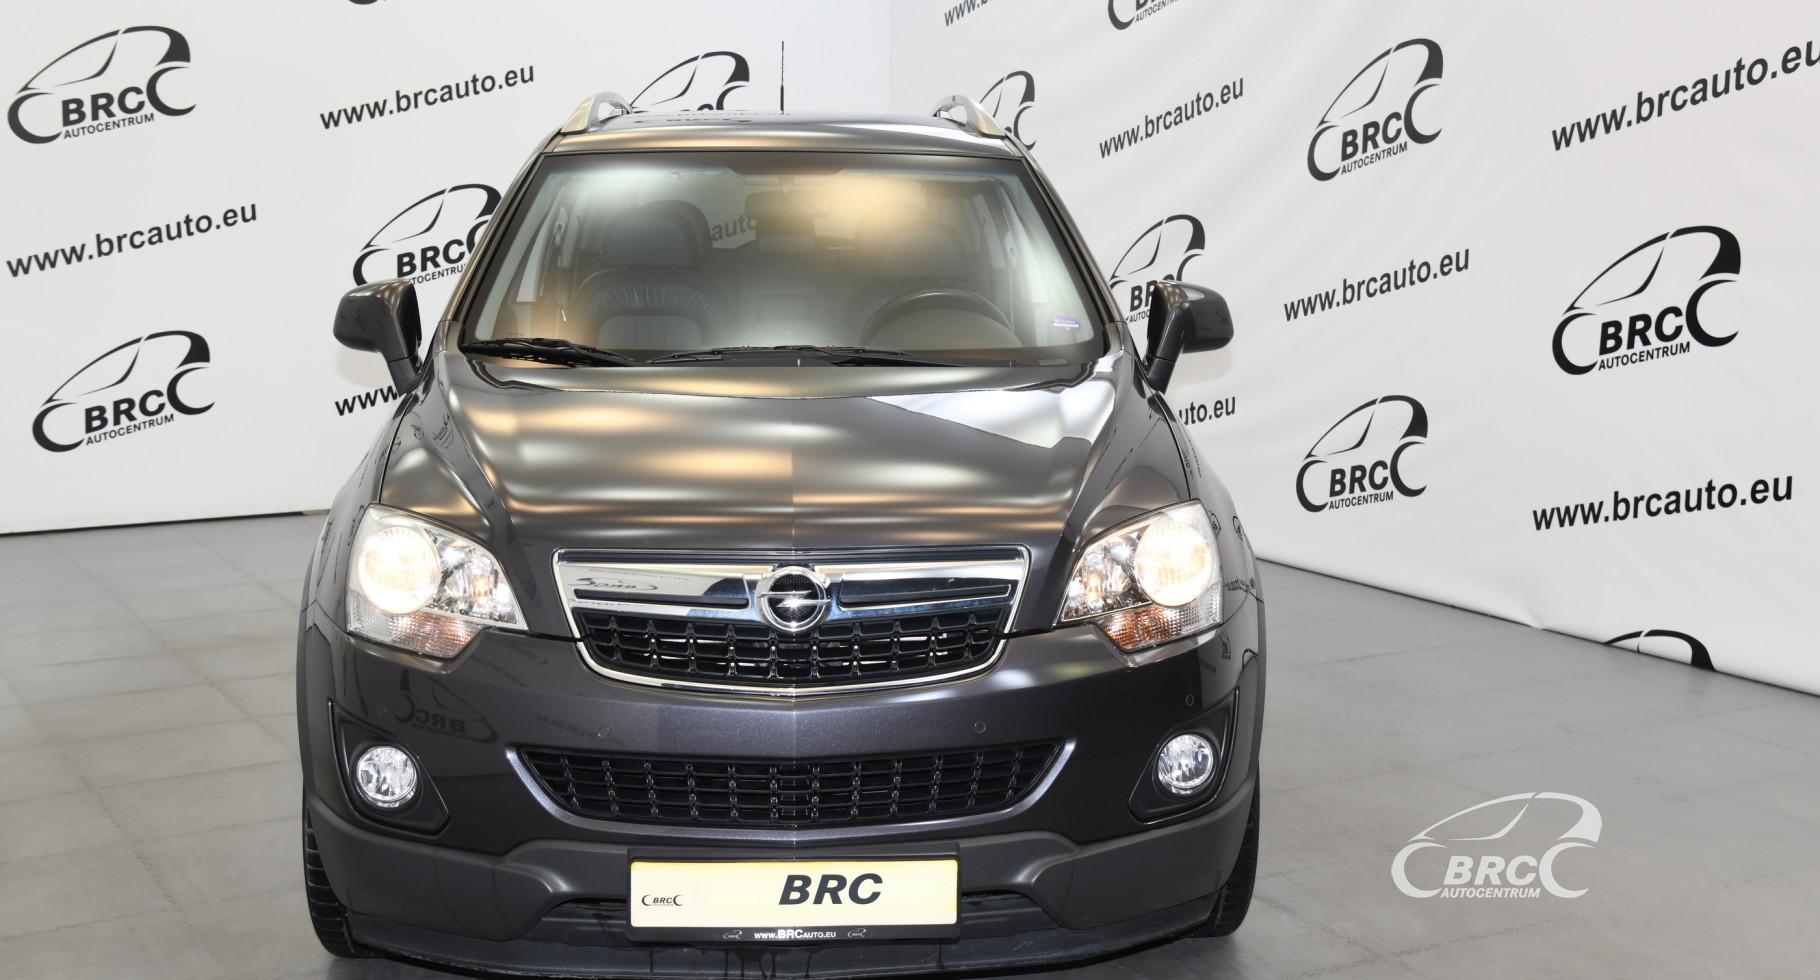 Opel Antara 2.2 CDTi Enjoy AWD